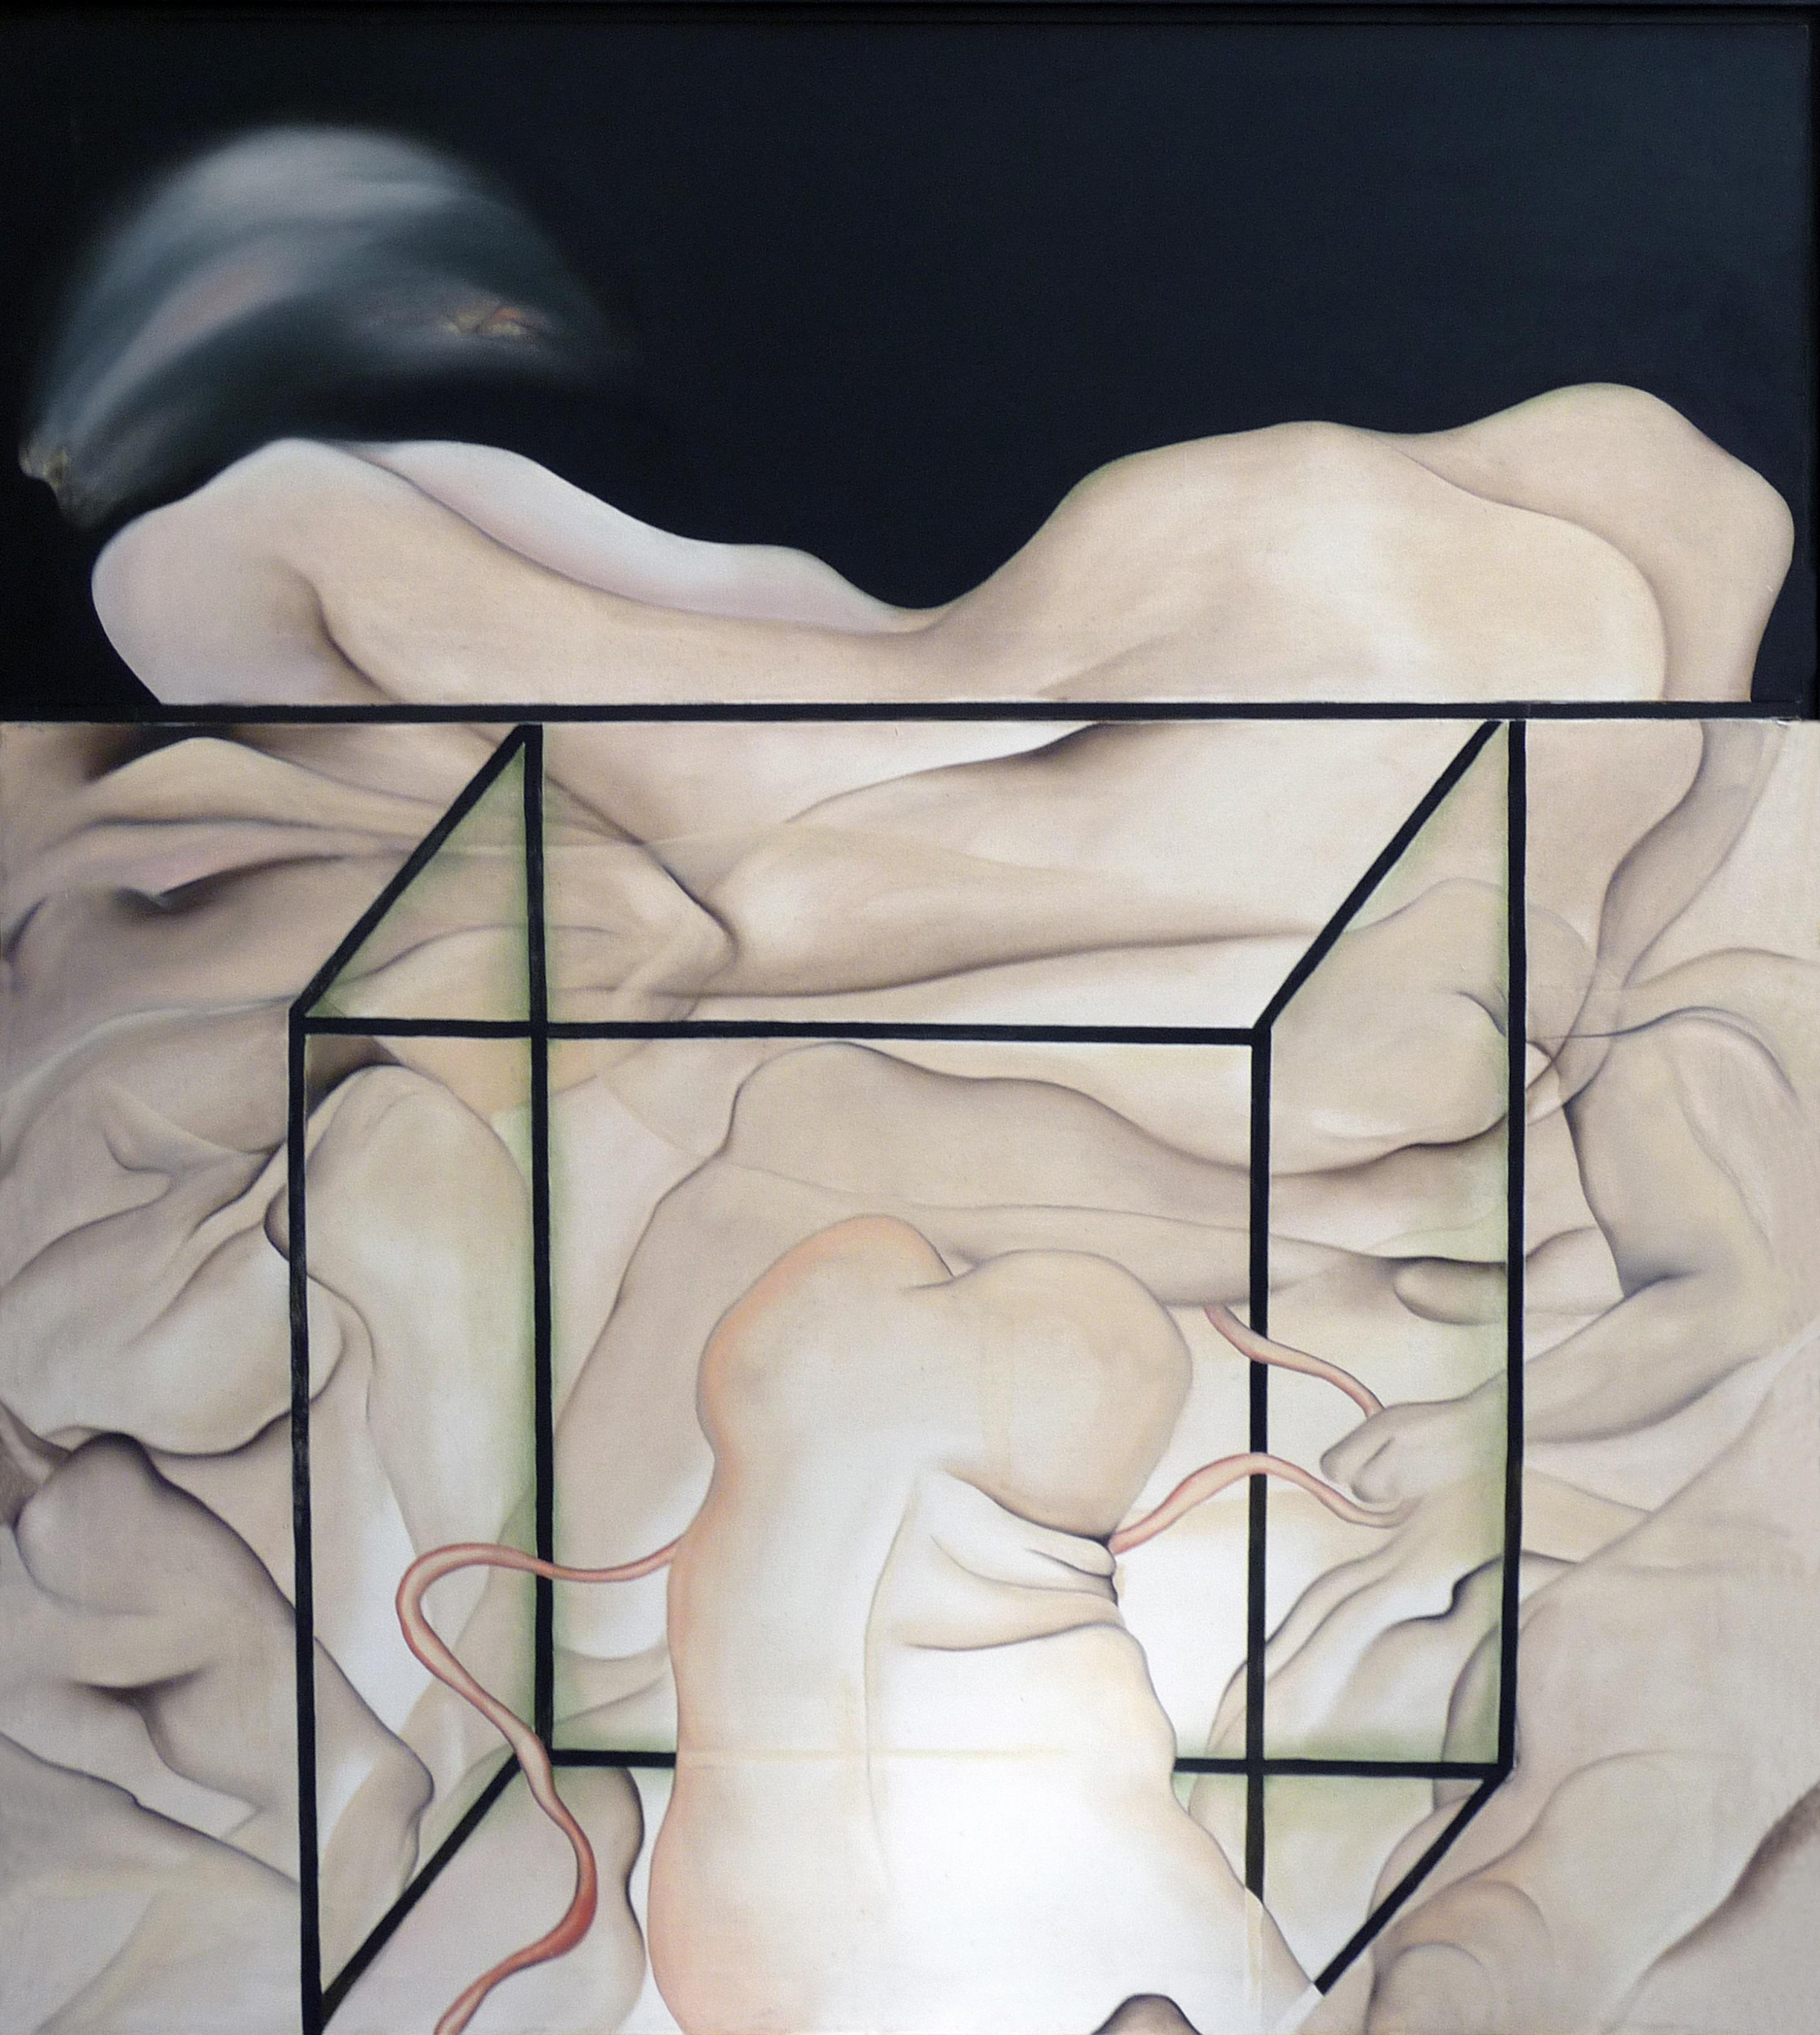 Maina-Miriam Munsky - Geburt II, 1967, Acryl auf Nessel, 136 x 120 cm